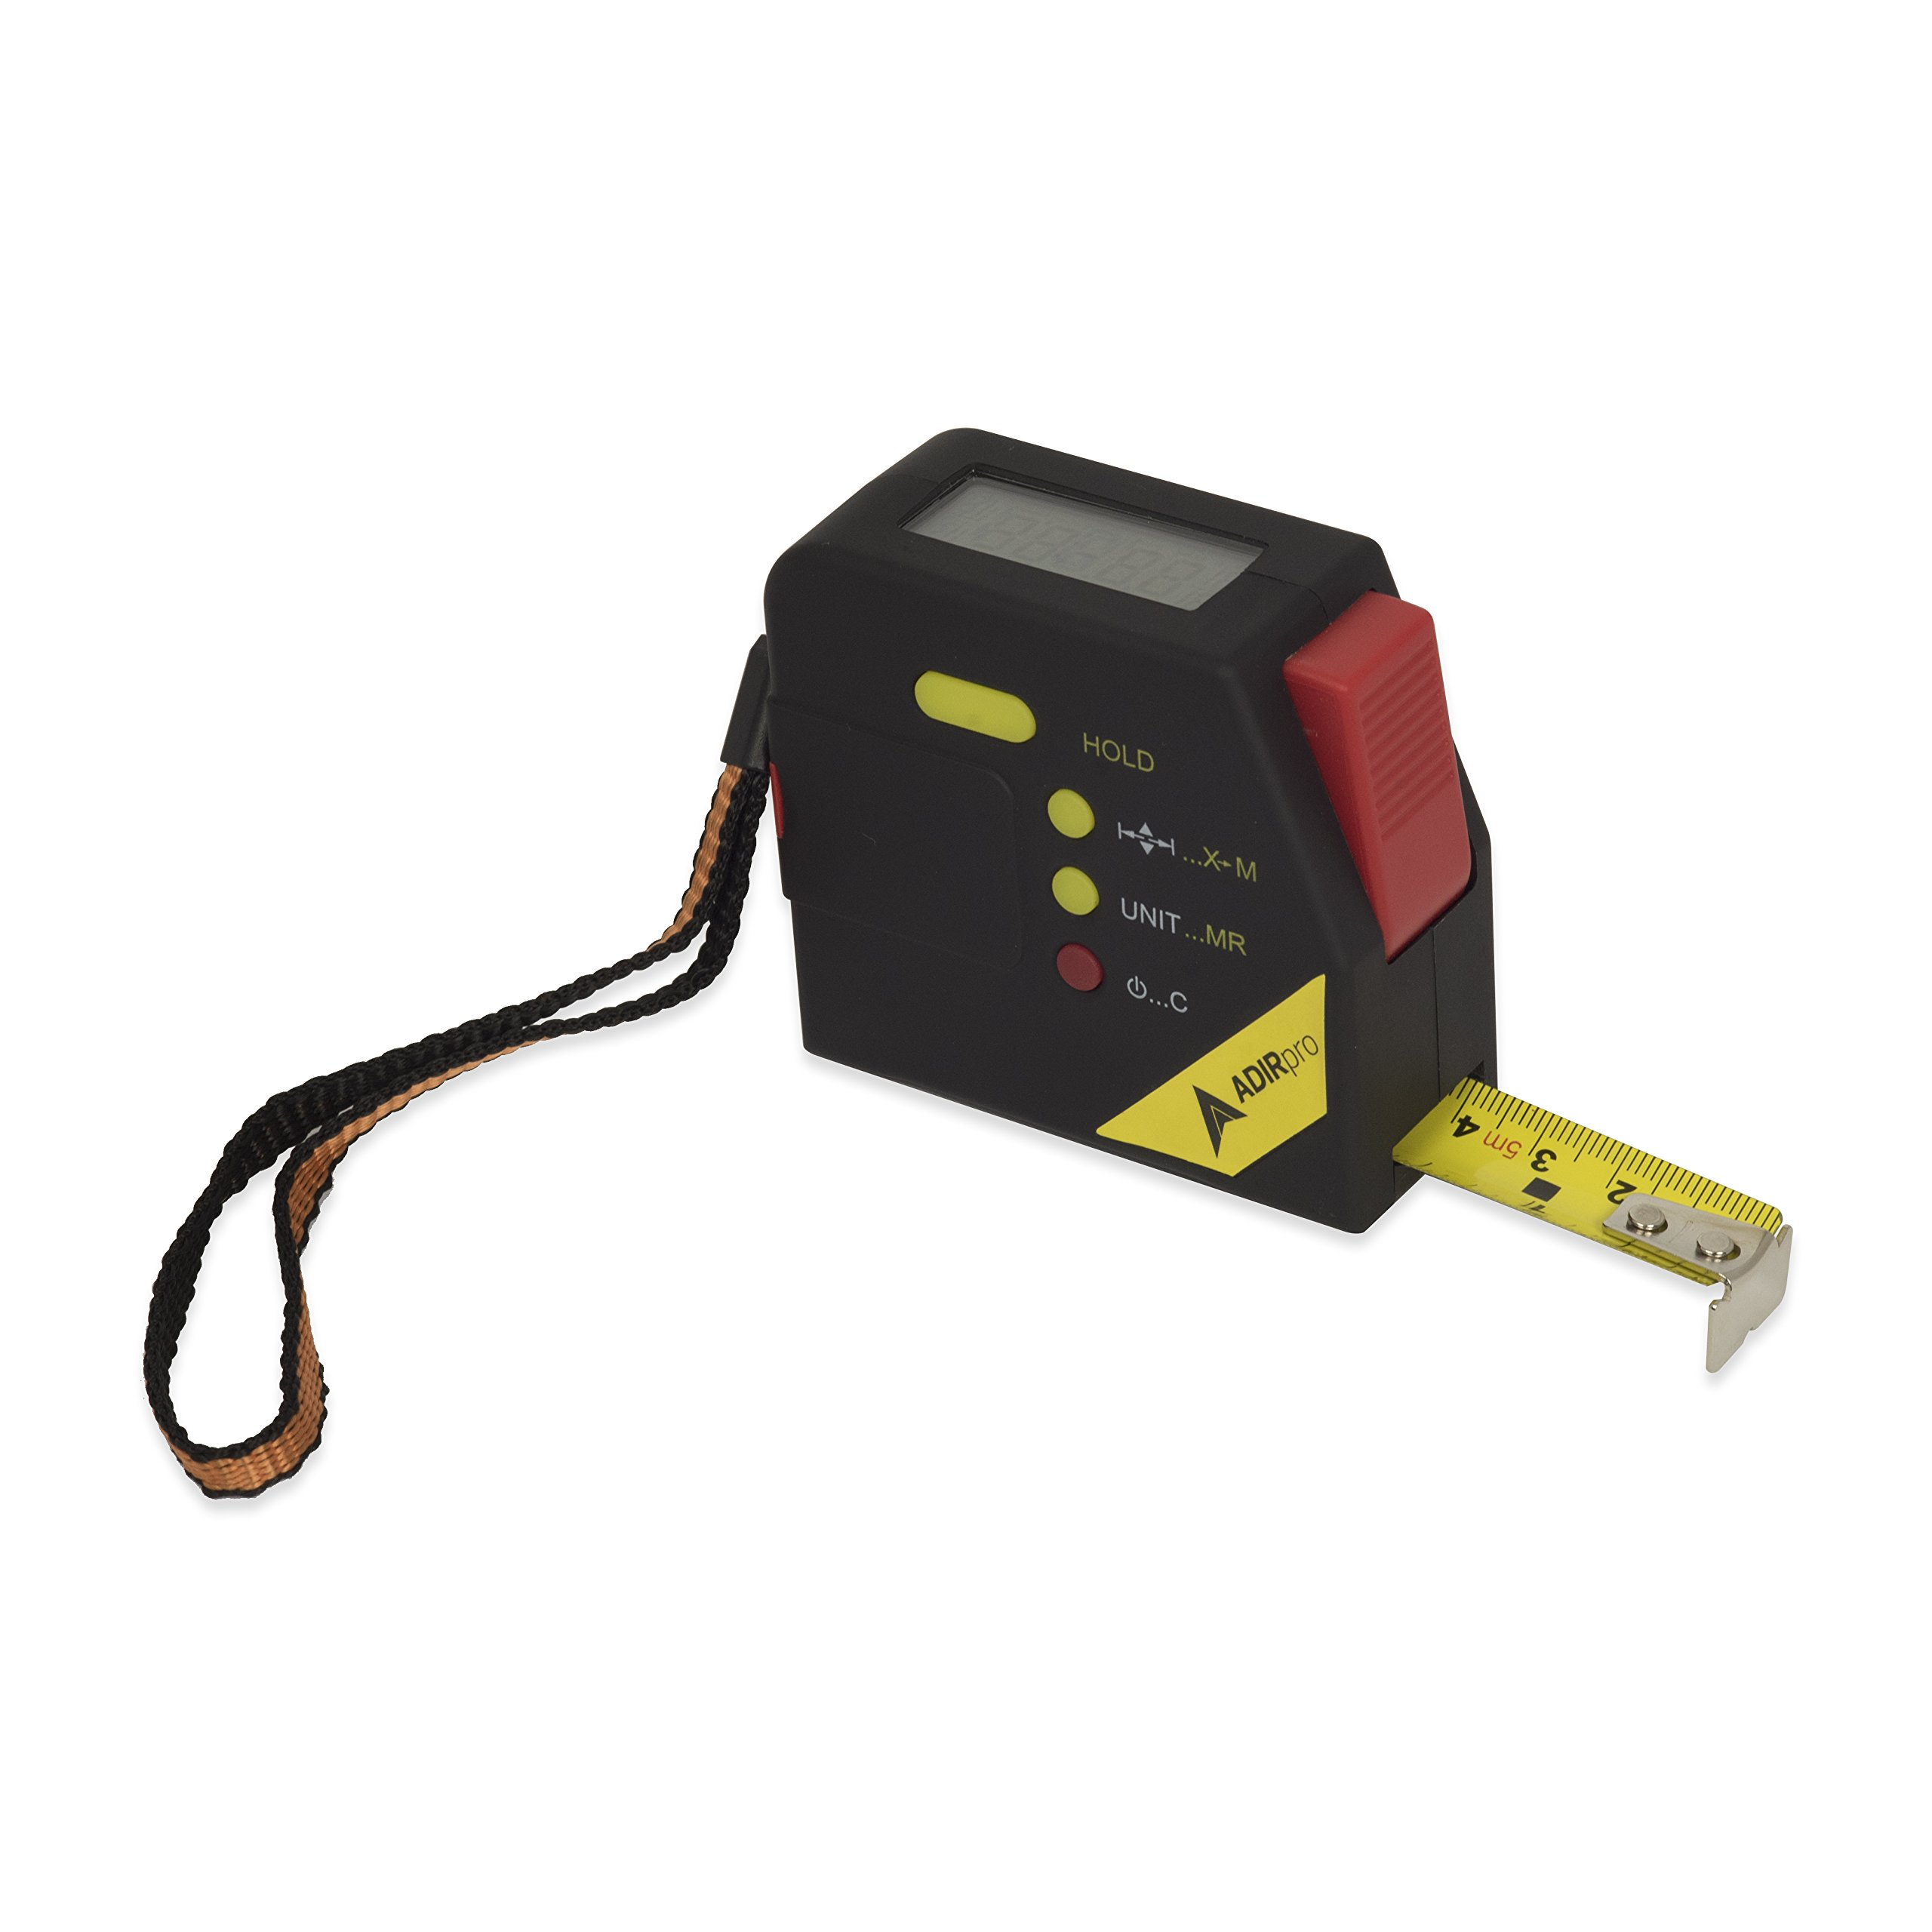 AdirPro 715-06 16' Retractable Digital Measuring Tape with LCD Display